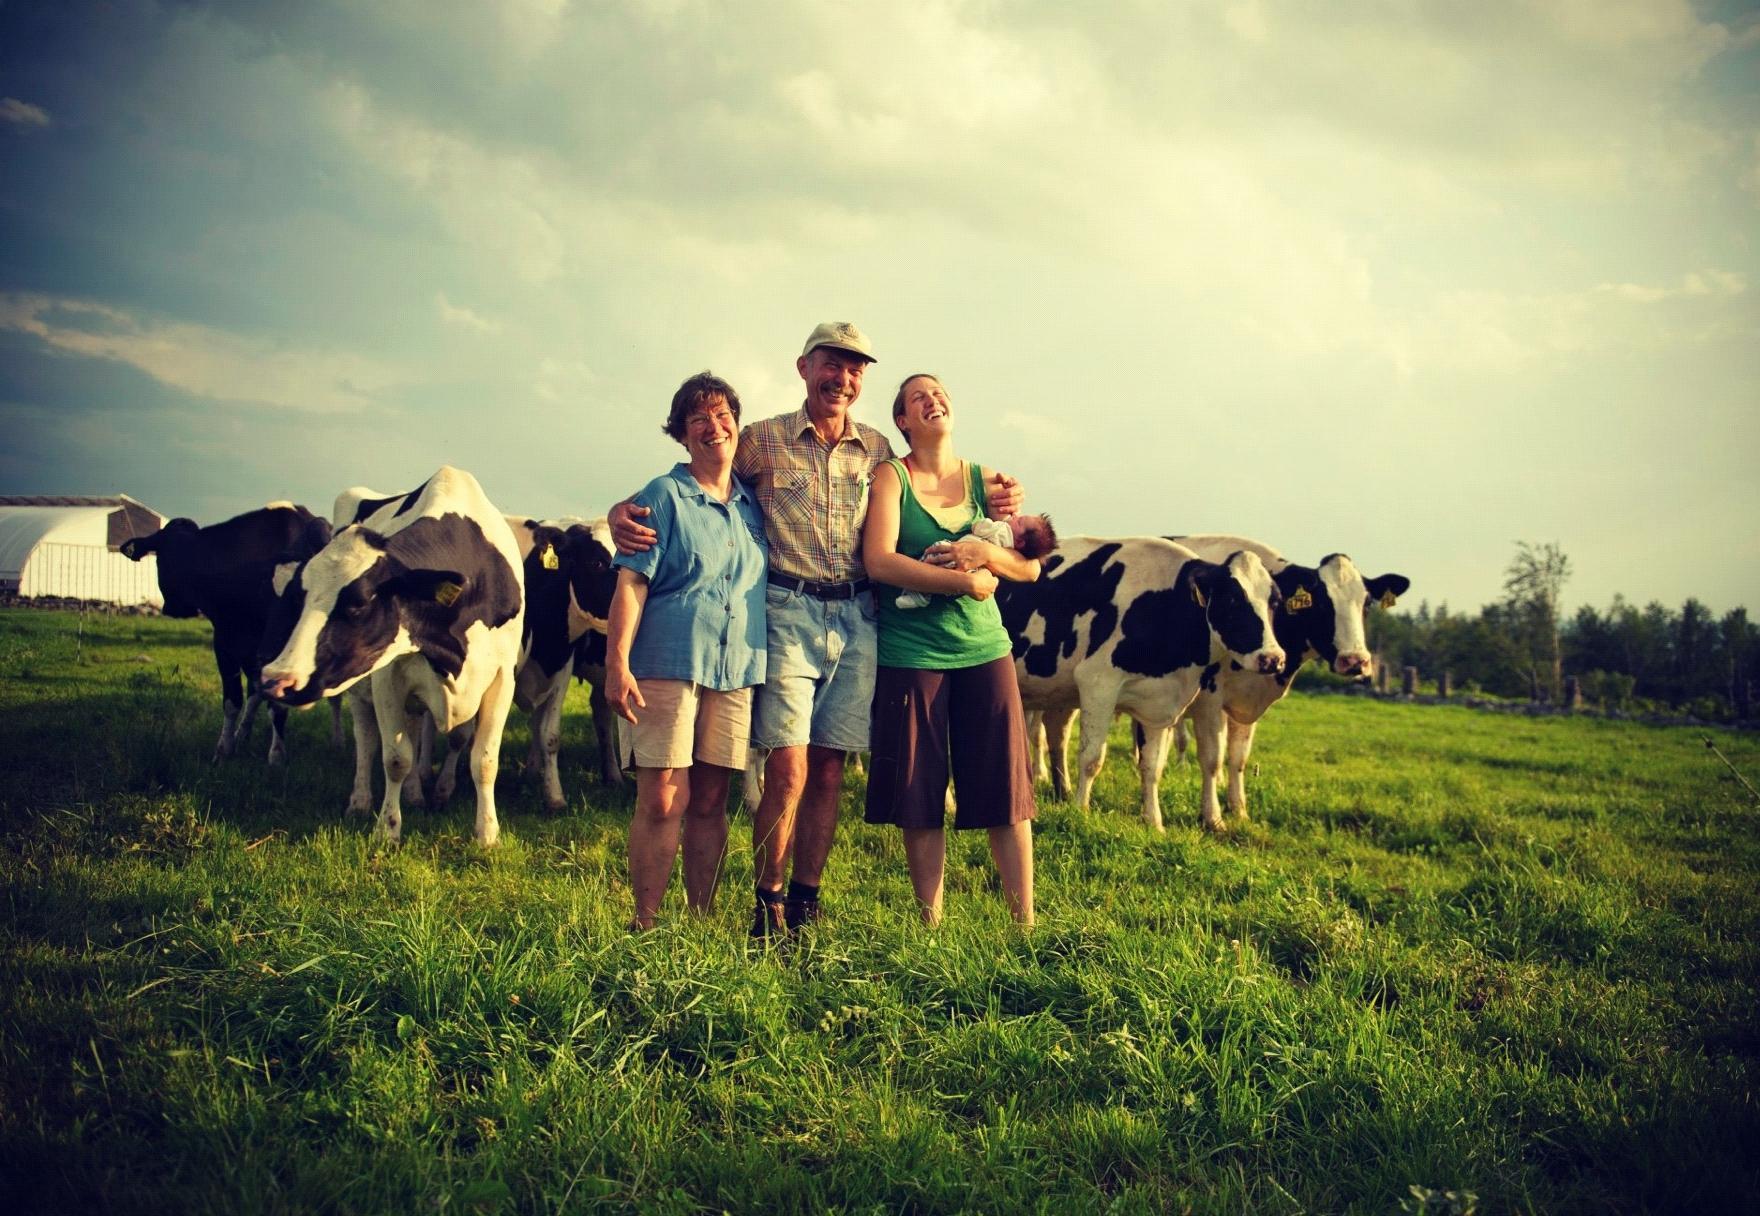 Corse Family Farm - family pic